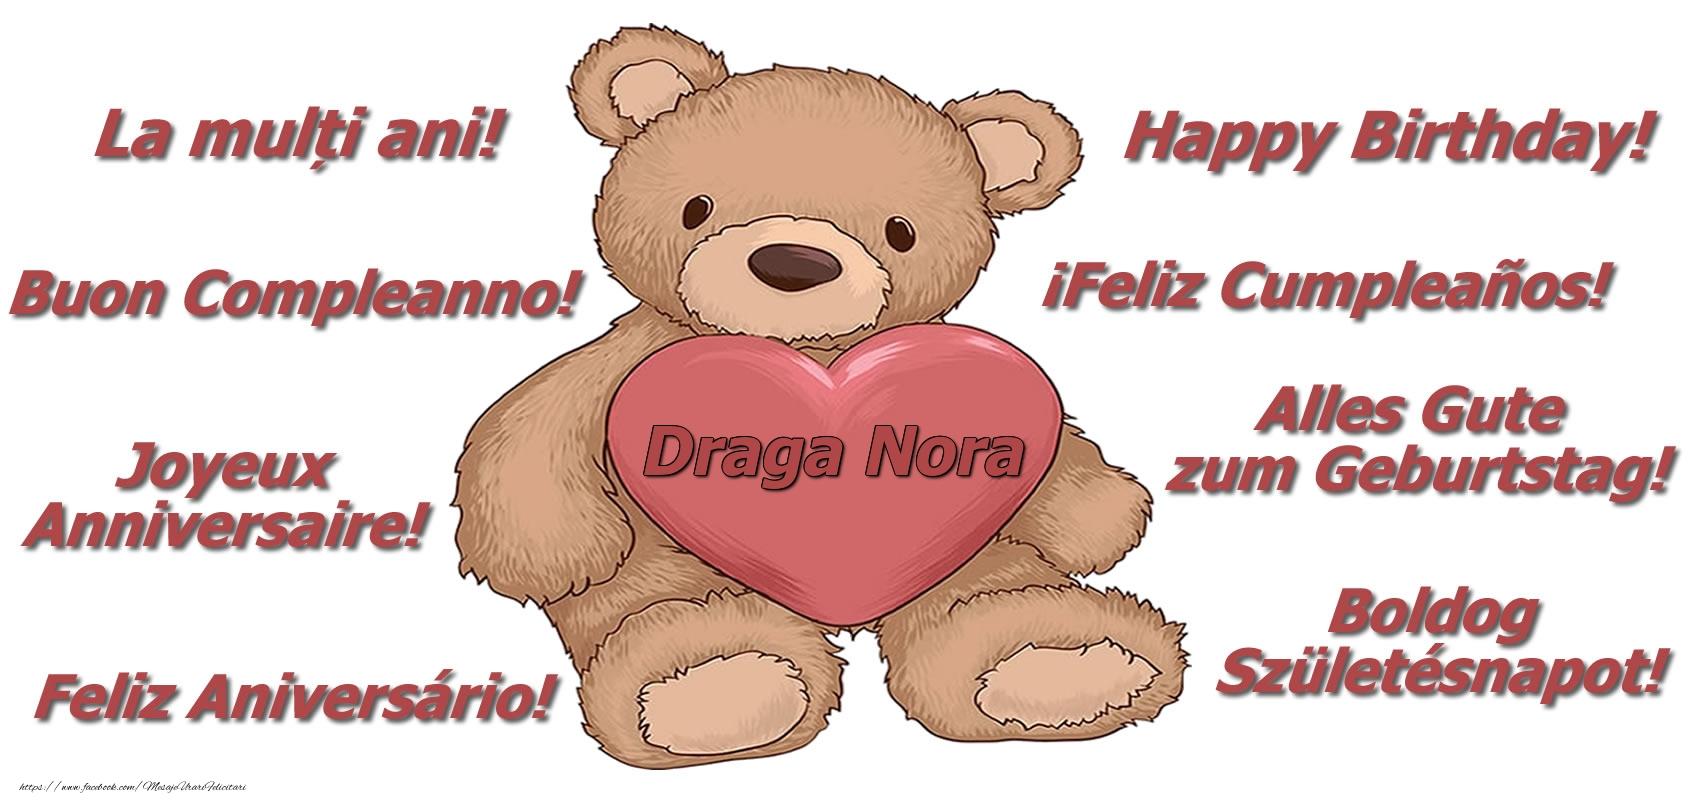 Felicitari de zi de nastere pentru Nora - La multi ani draga nora! - Ursulet